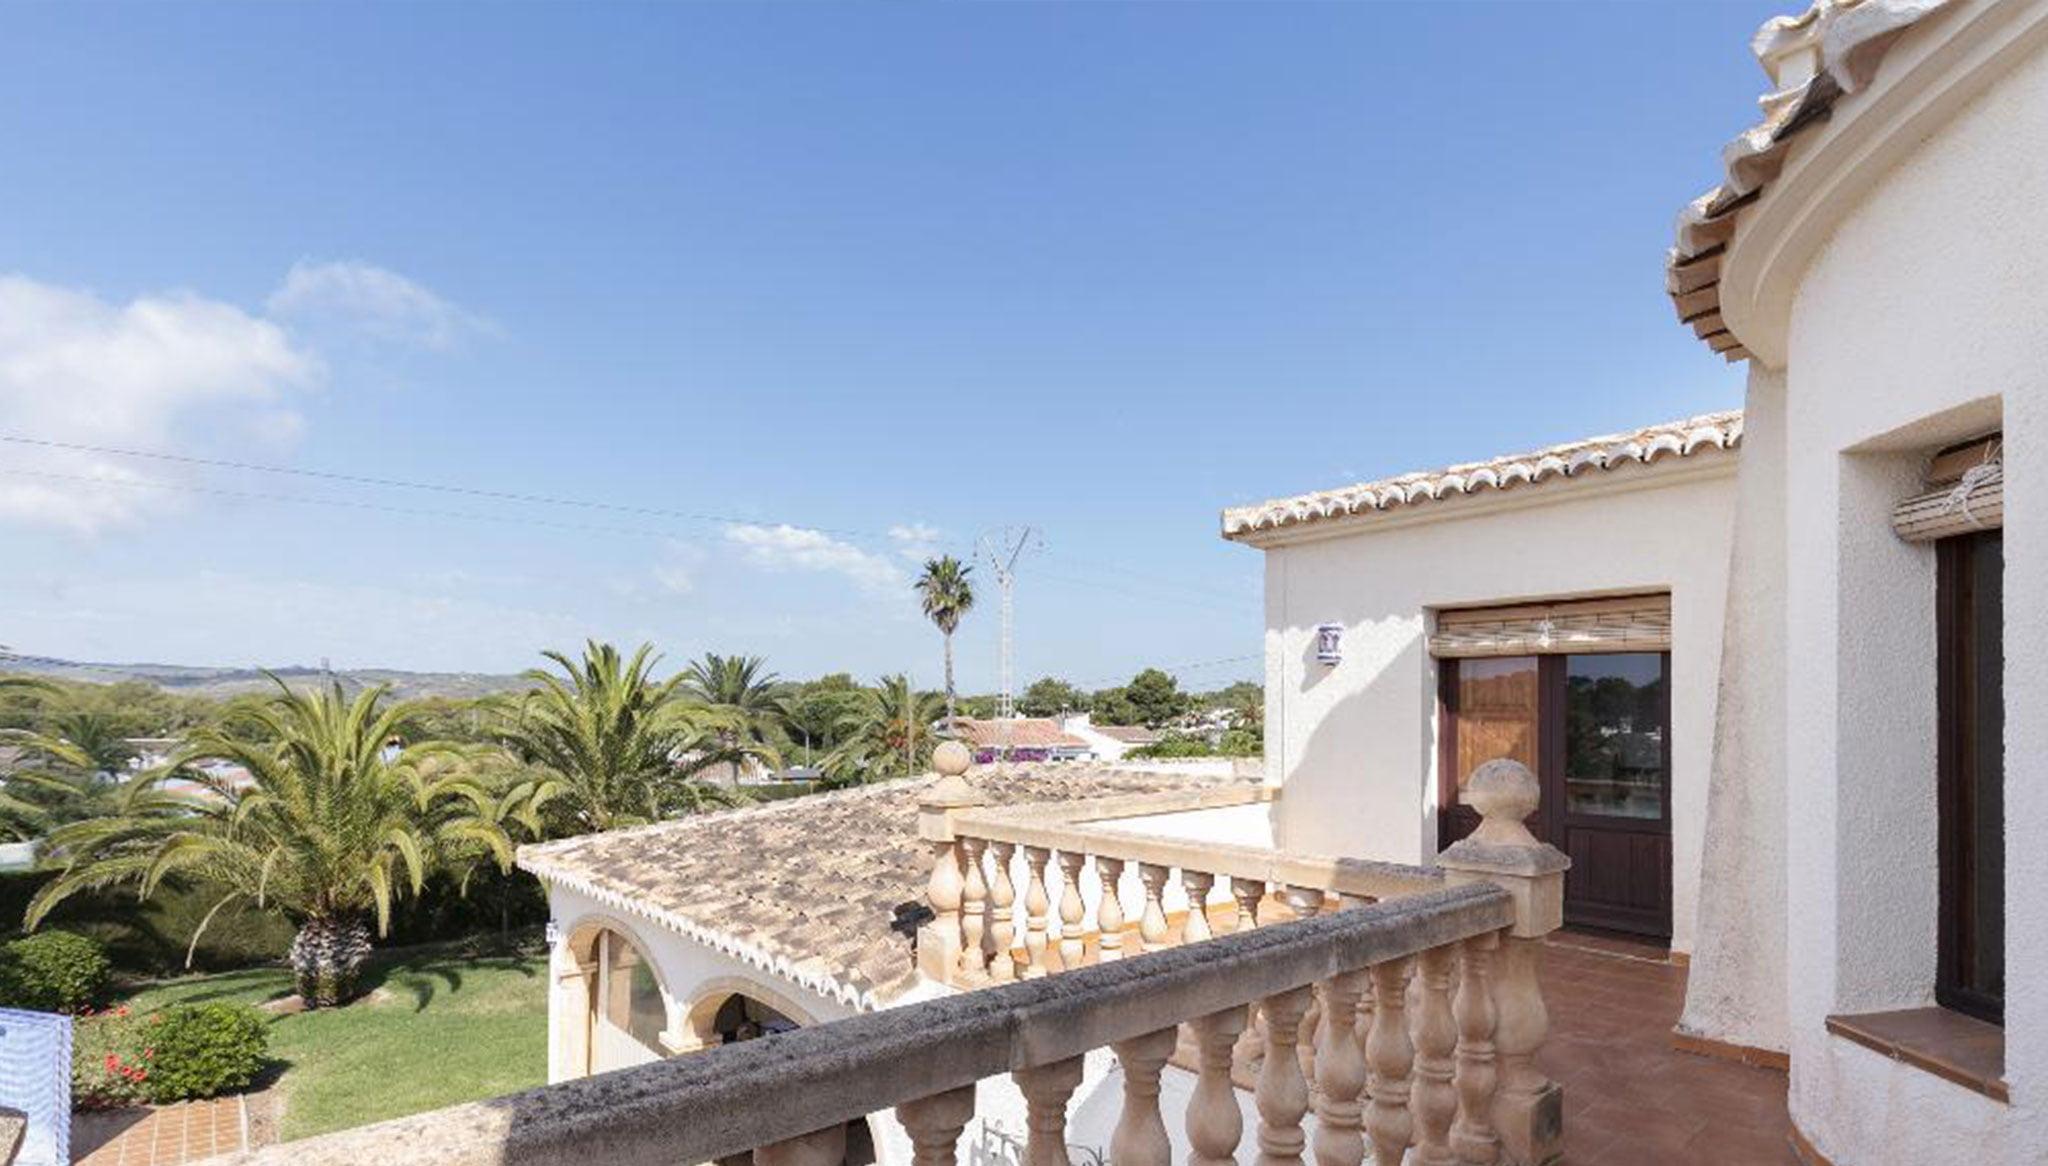 Vistas desde la terraza de un chalet de alquiler en Jávea – Quality Rent a Villa